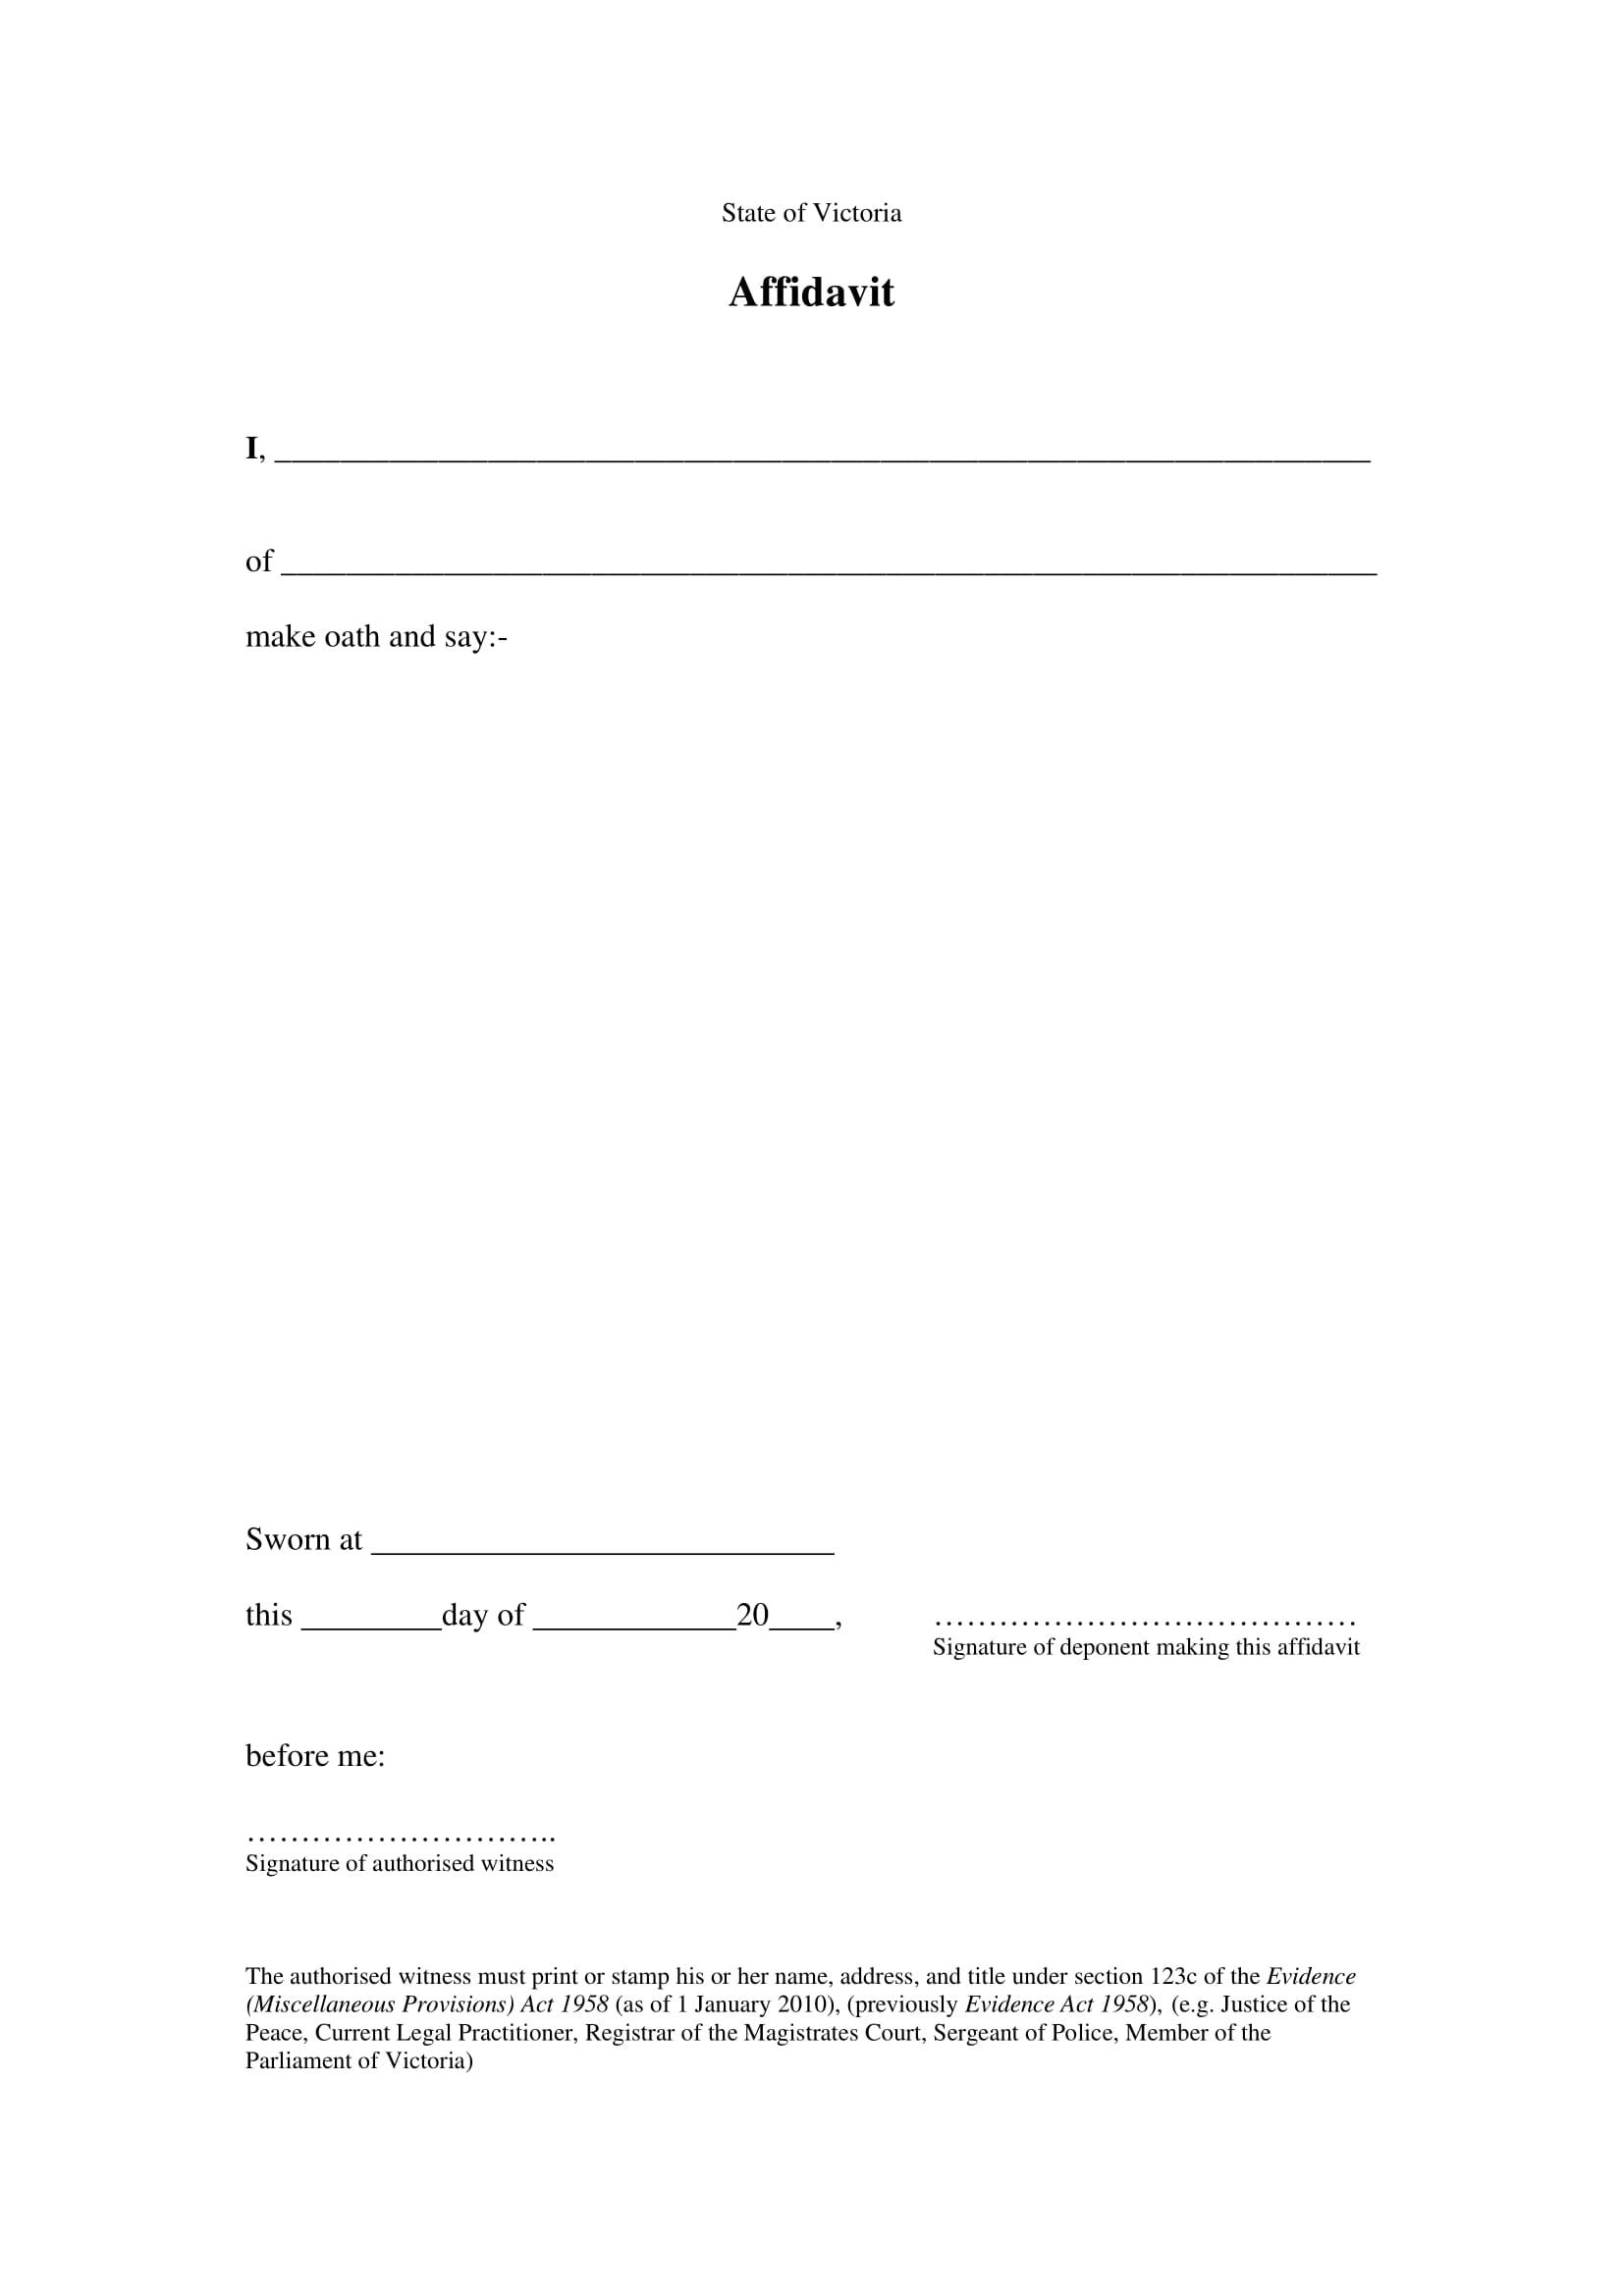 affidavit form sworn statement 2010